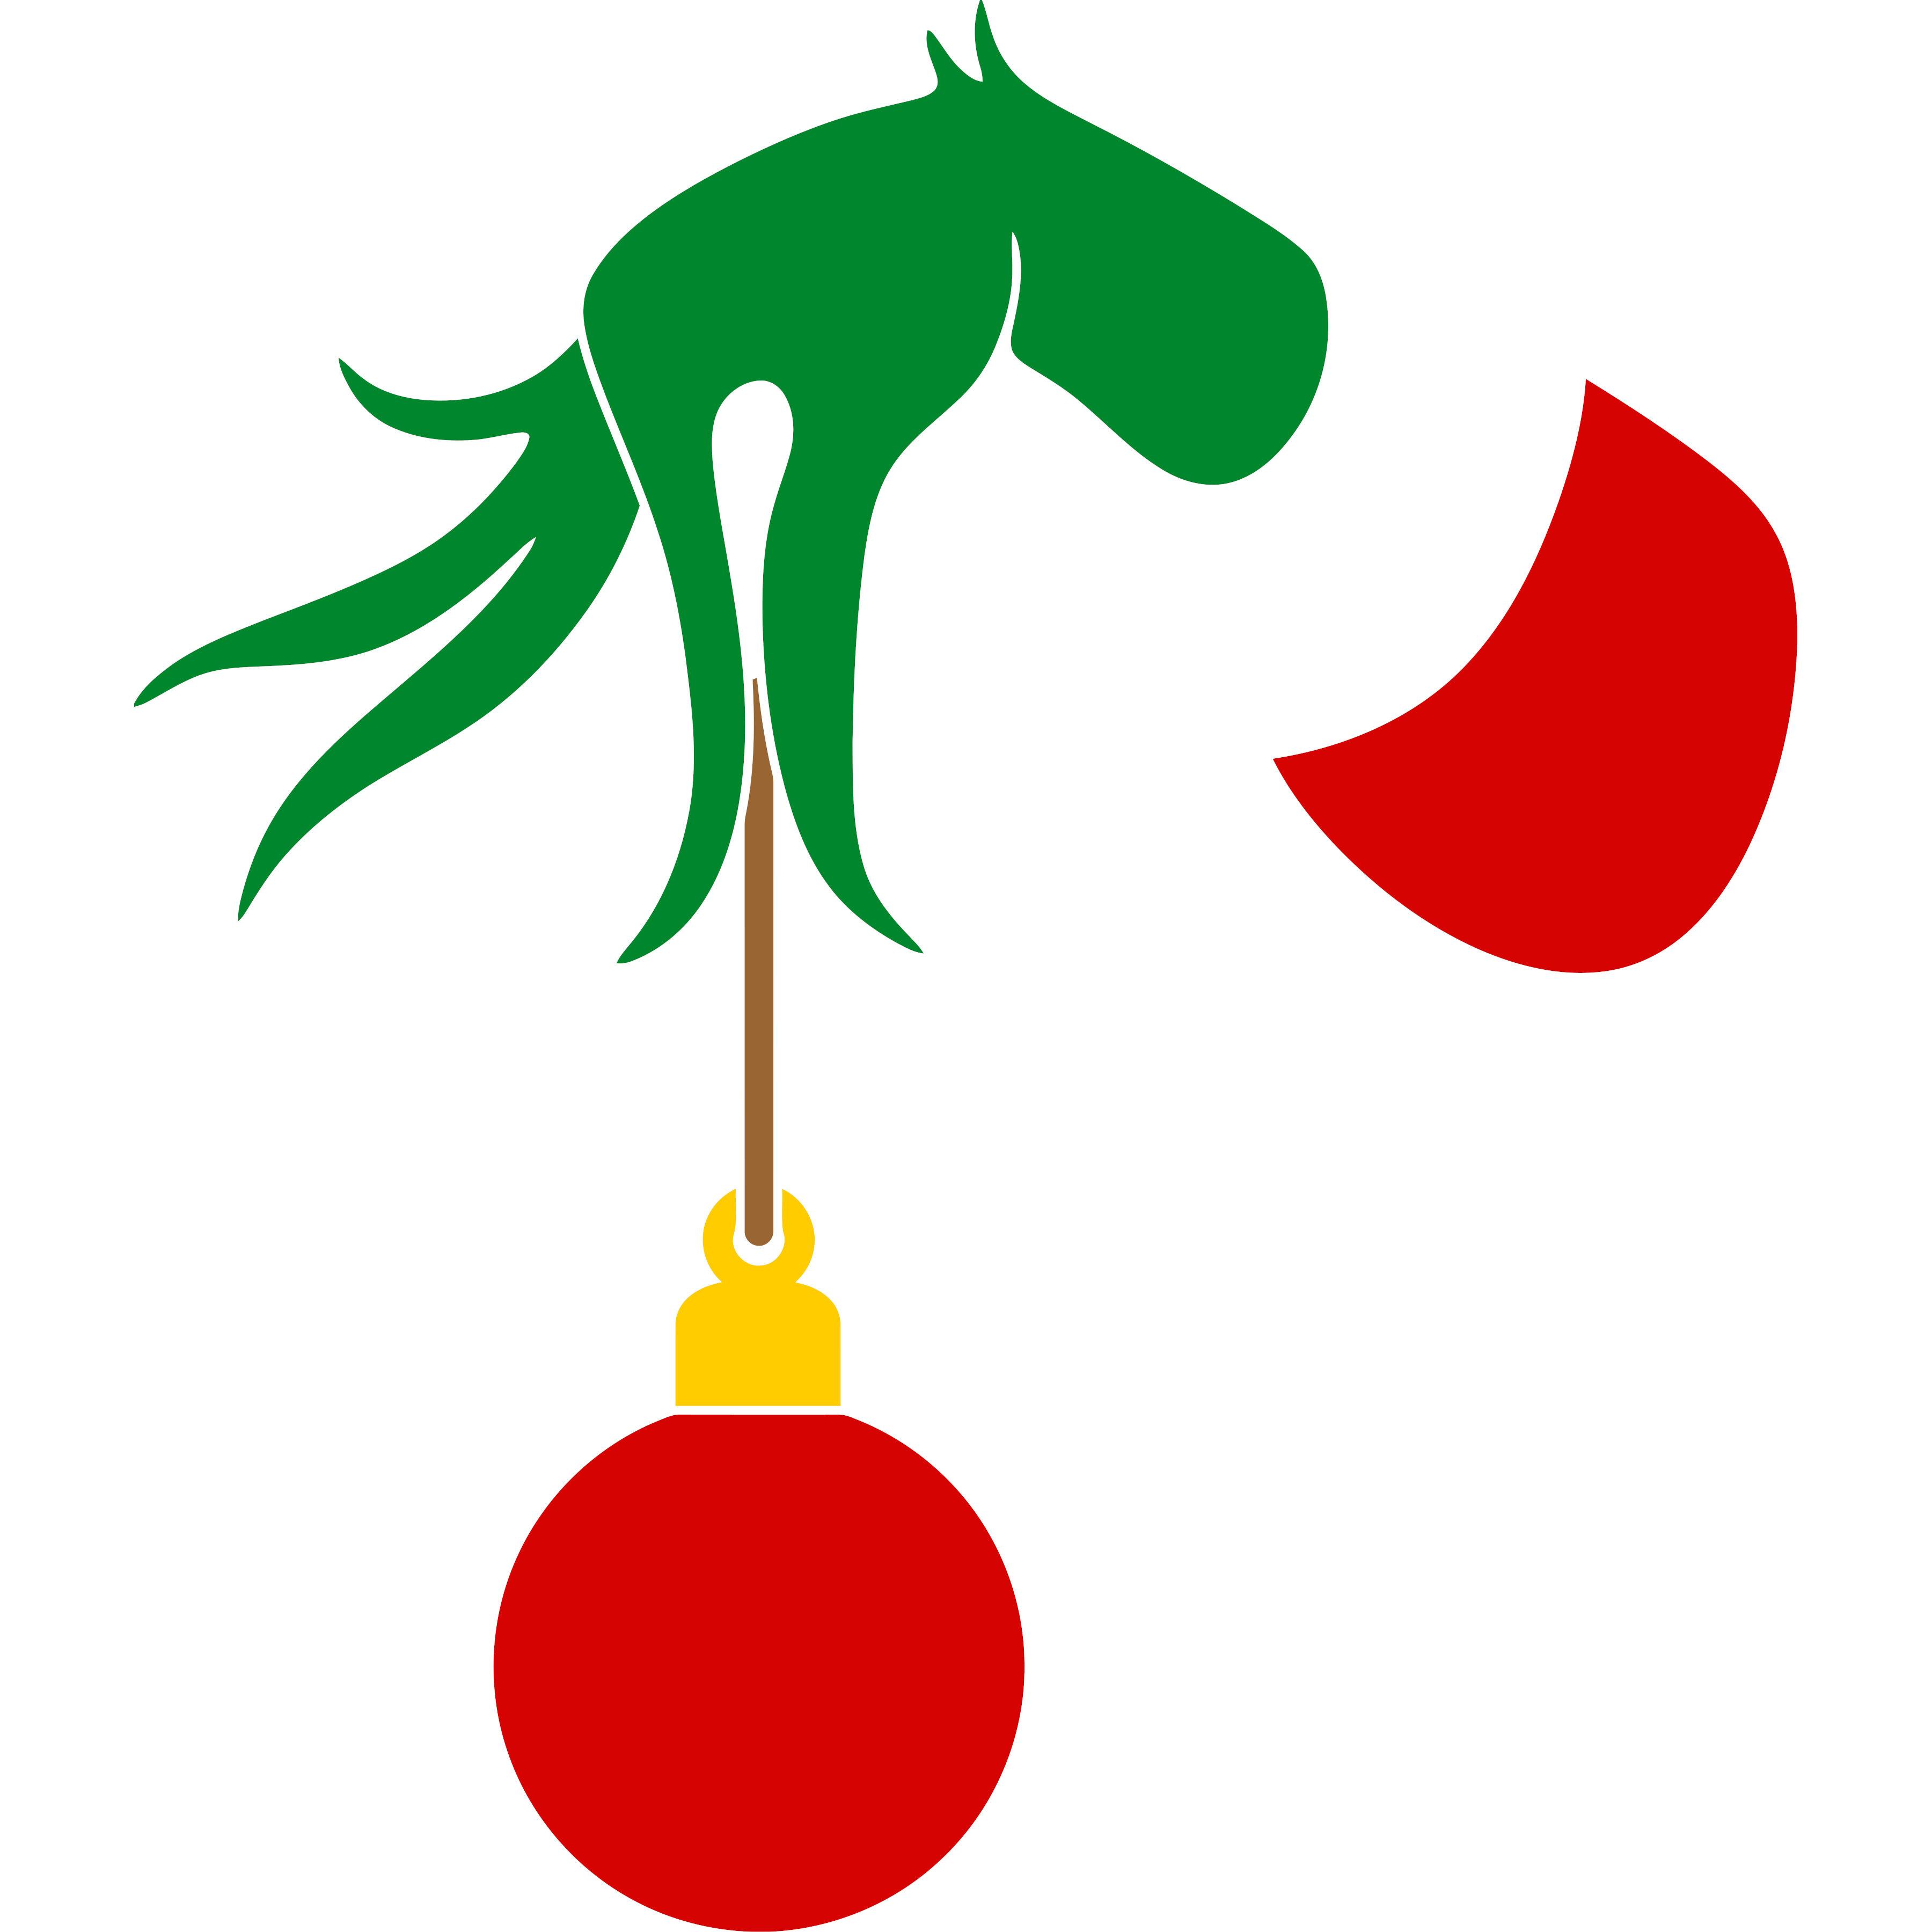 Christmas Bulb Png.Christmas Bulb Gift Grinch Hand Svg And Png Cutfilesplus